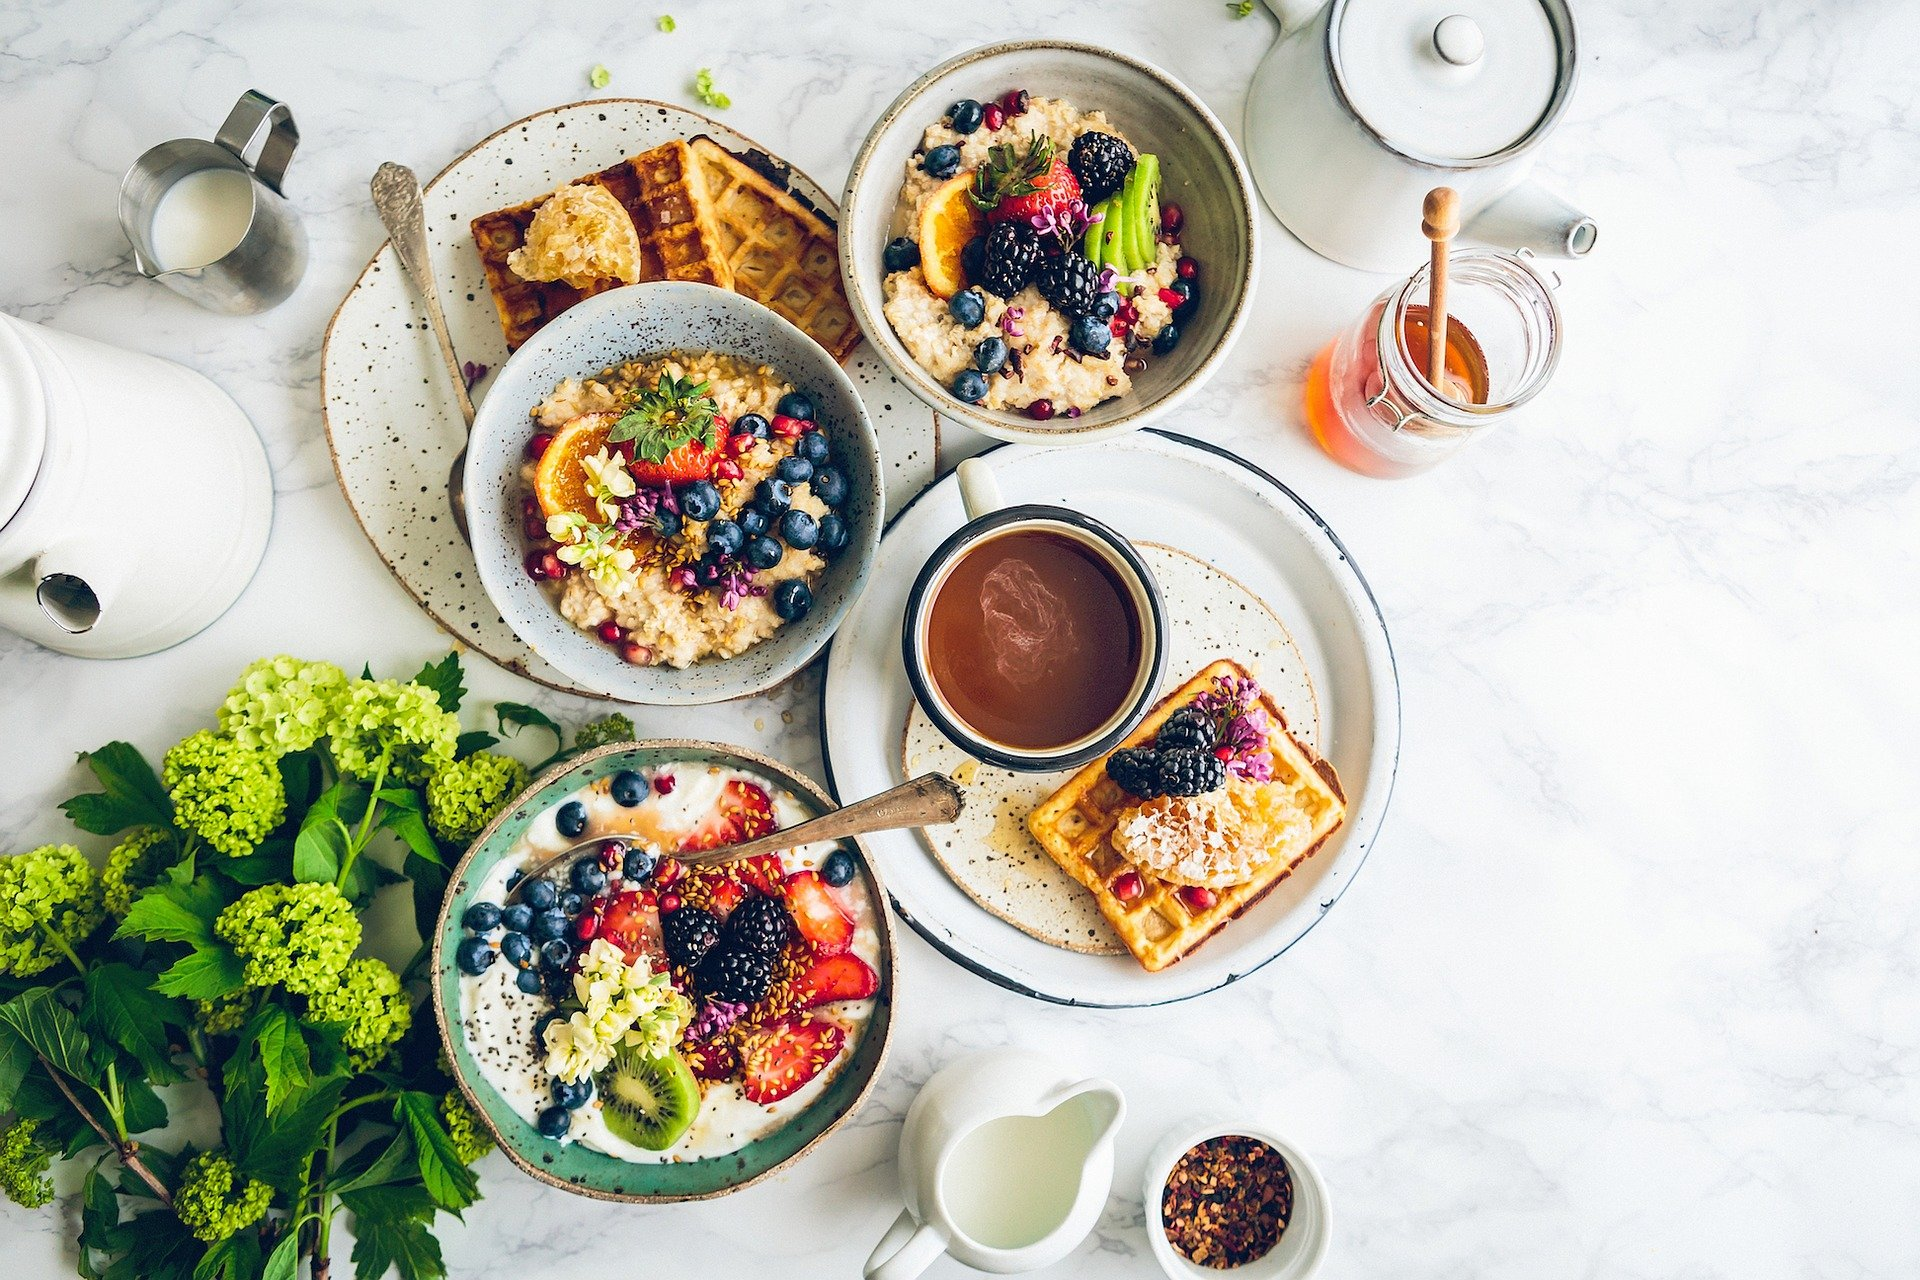 Frühstück liefern lassen